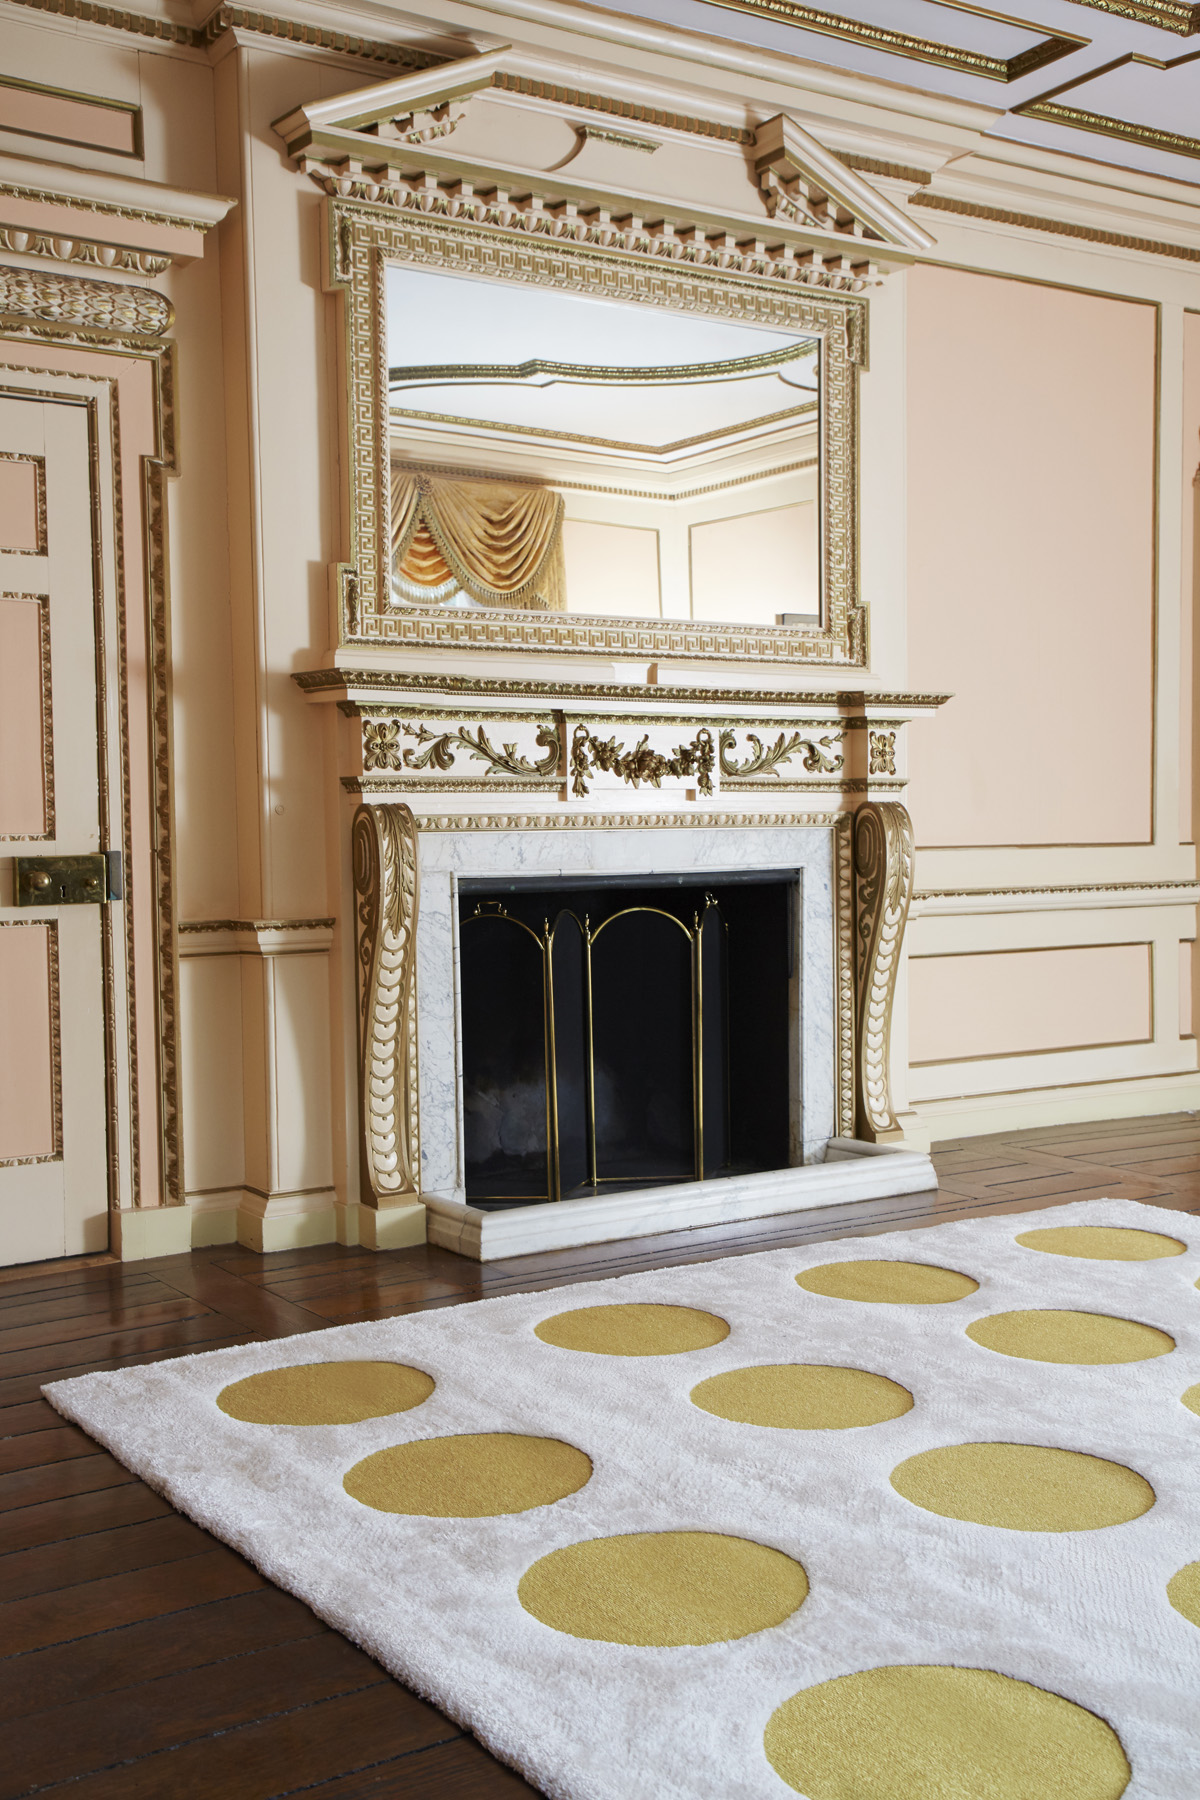 Disco Dots Rug in Gold & Pearl by Sasha Bikoff Rugs Interior Design NYC